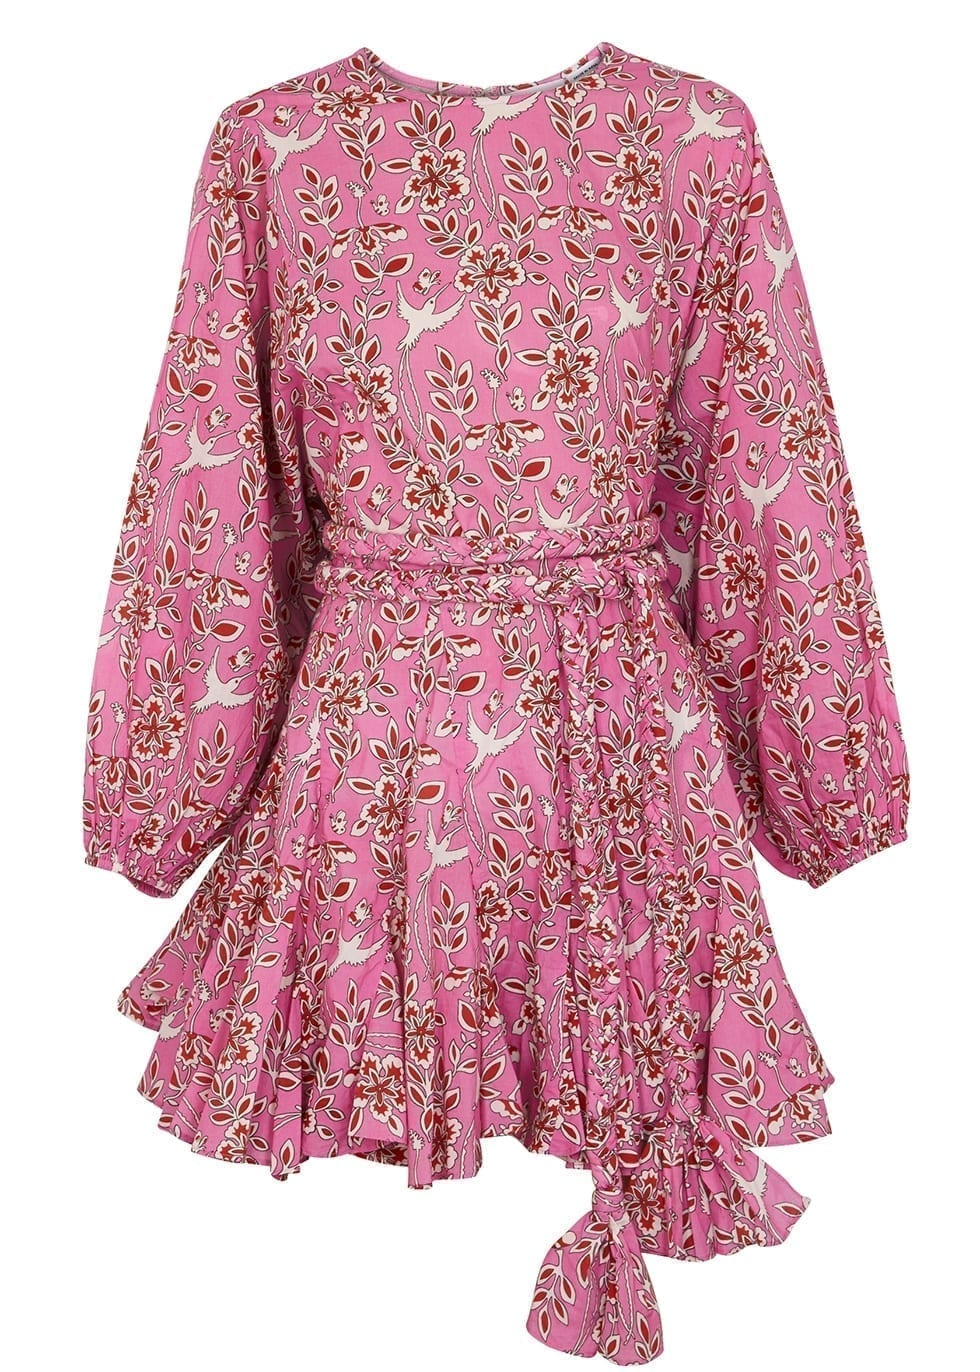 RHODE Ella Printed Cotton Dress